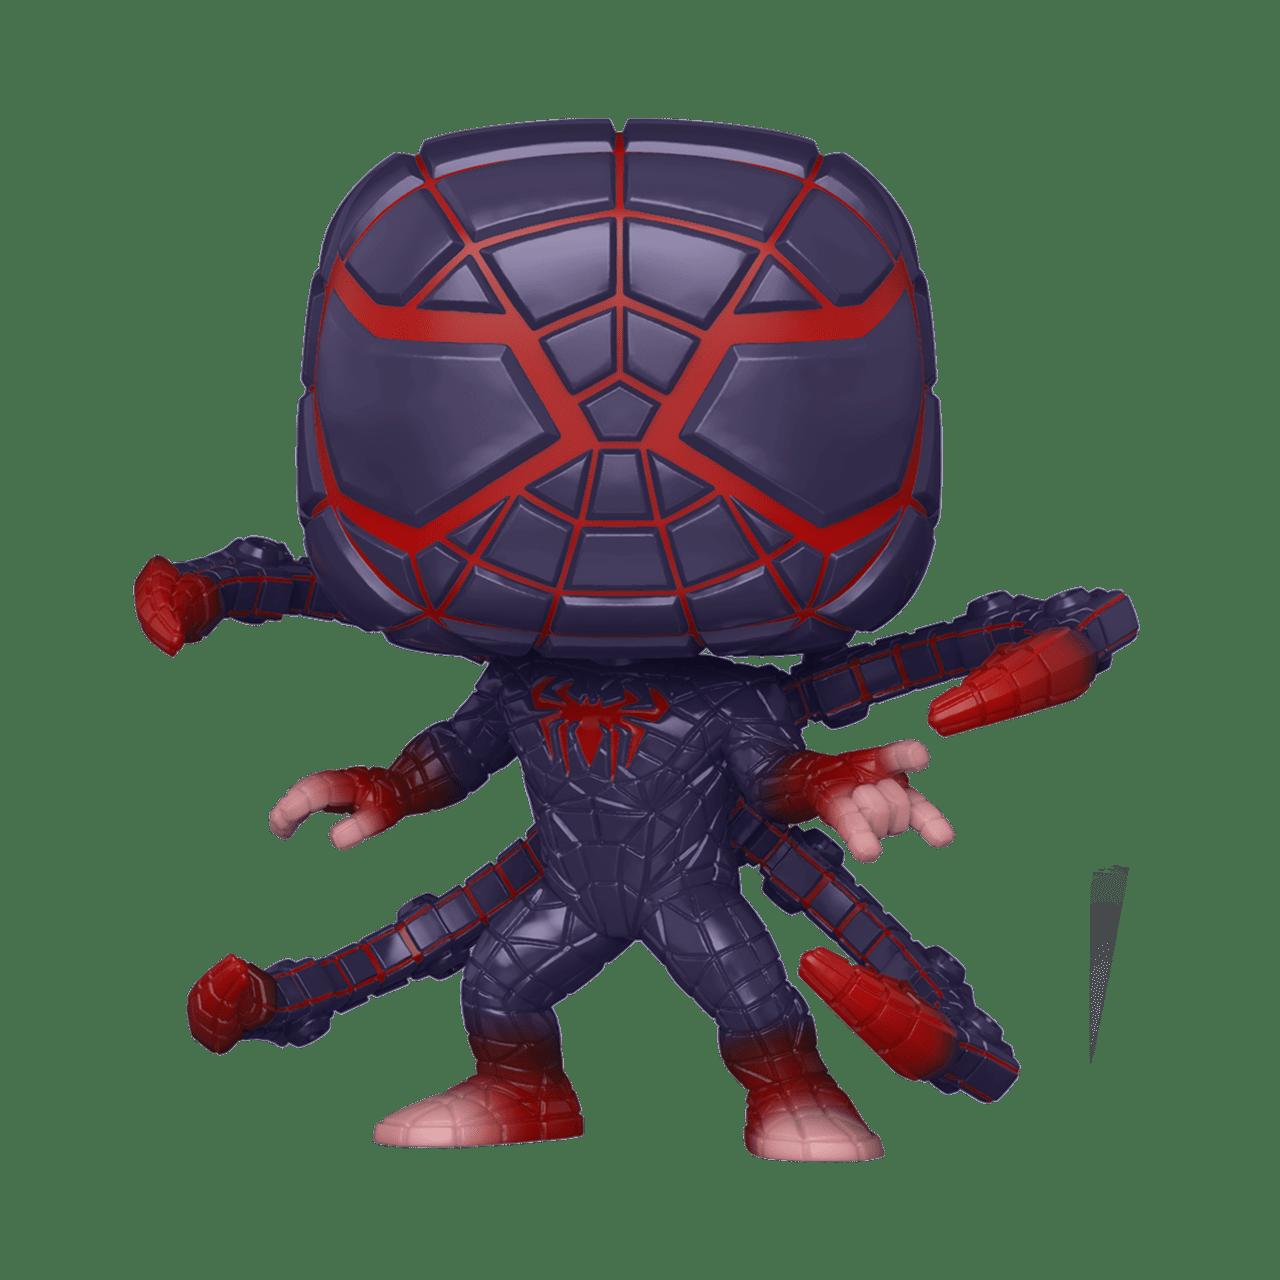 Miles Morales: Programmable Matter Suit (773) Spider-Man Game: Marvel Pop Vinyl - 1